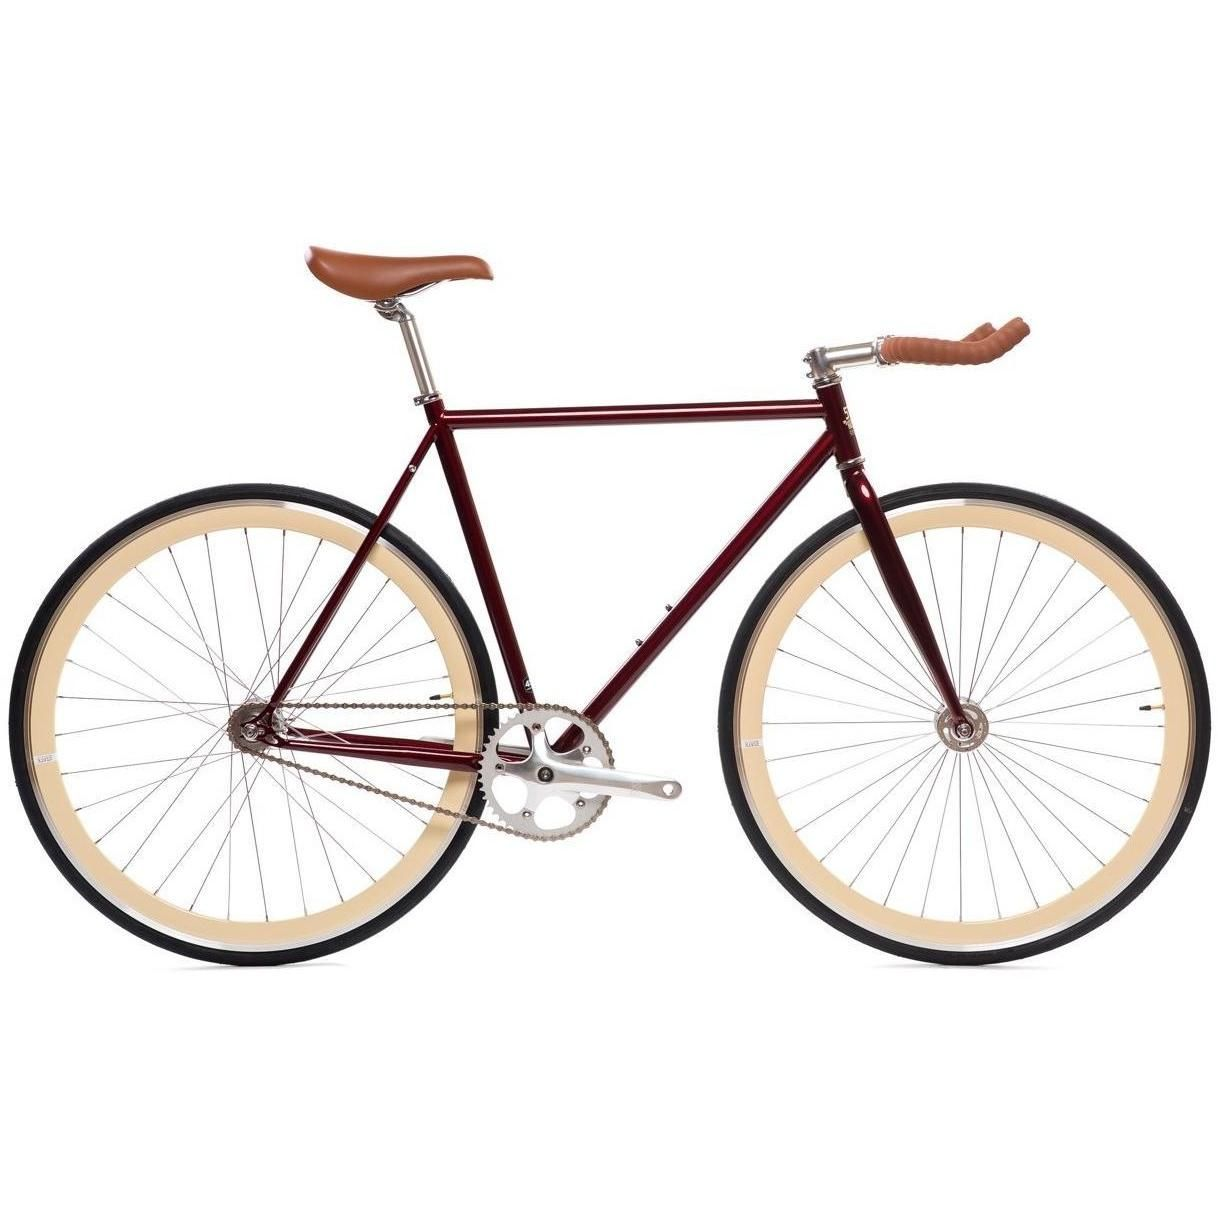 State Bicycle Co. 4130 Core Line | Ashton Burgundy Fixed Gear Bike